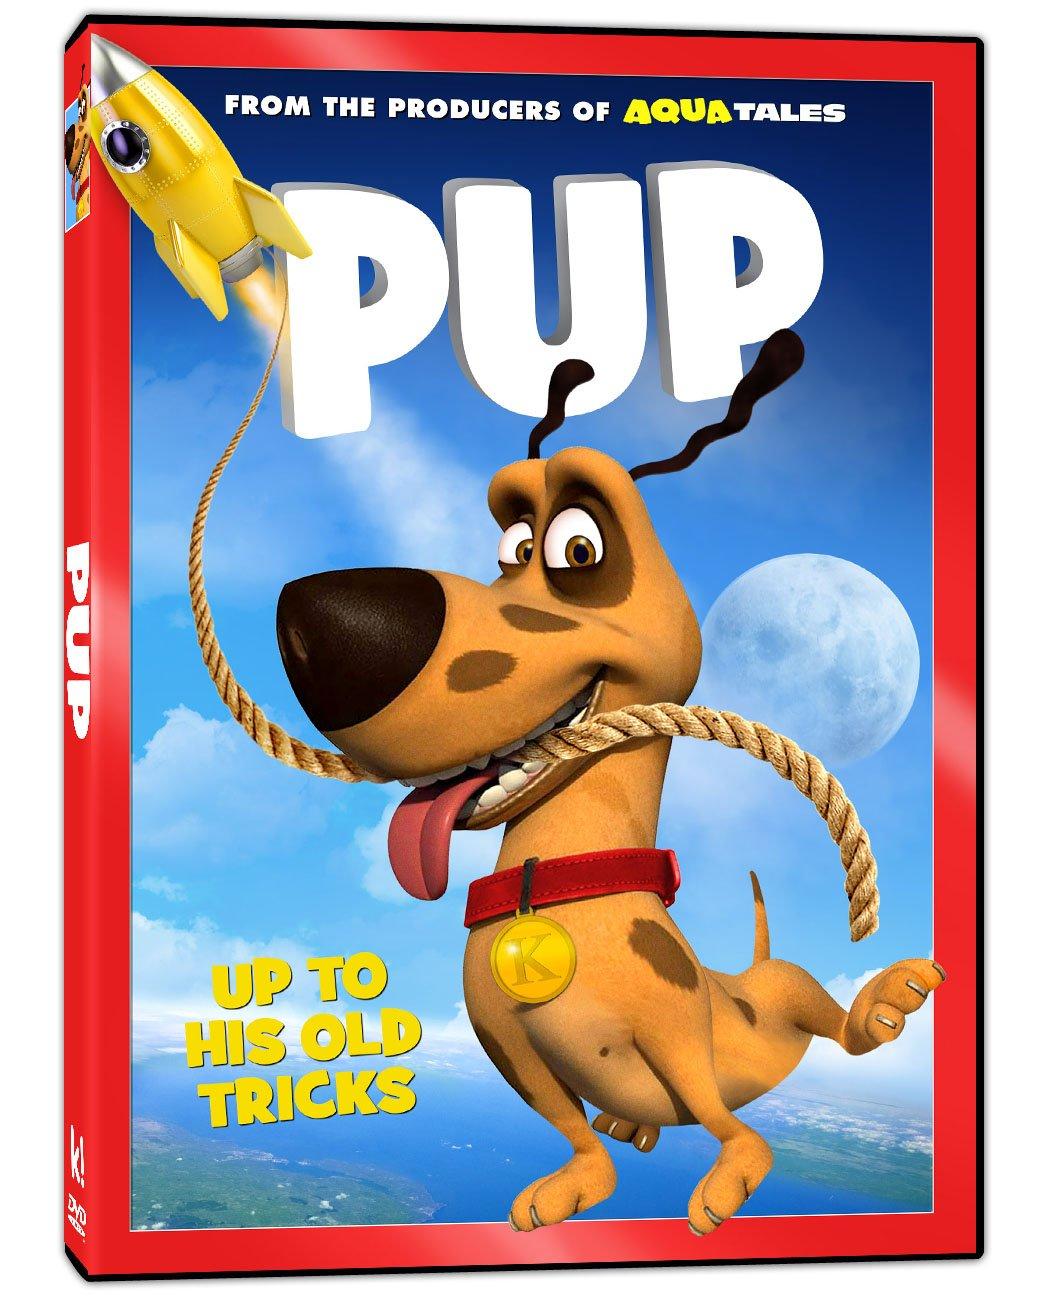 Pup (2013) [English] DM - Emilee Wallace, Kristina Hughes, Peter Hudson